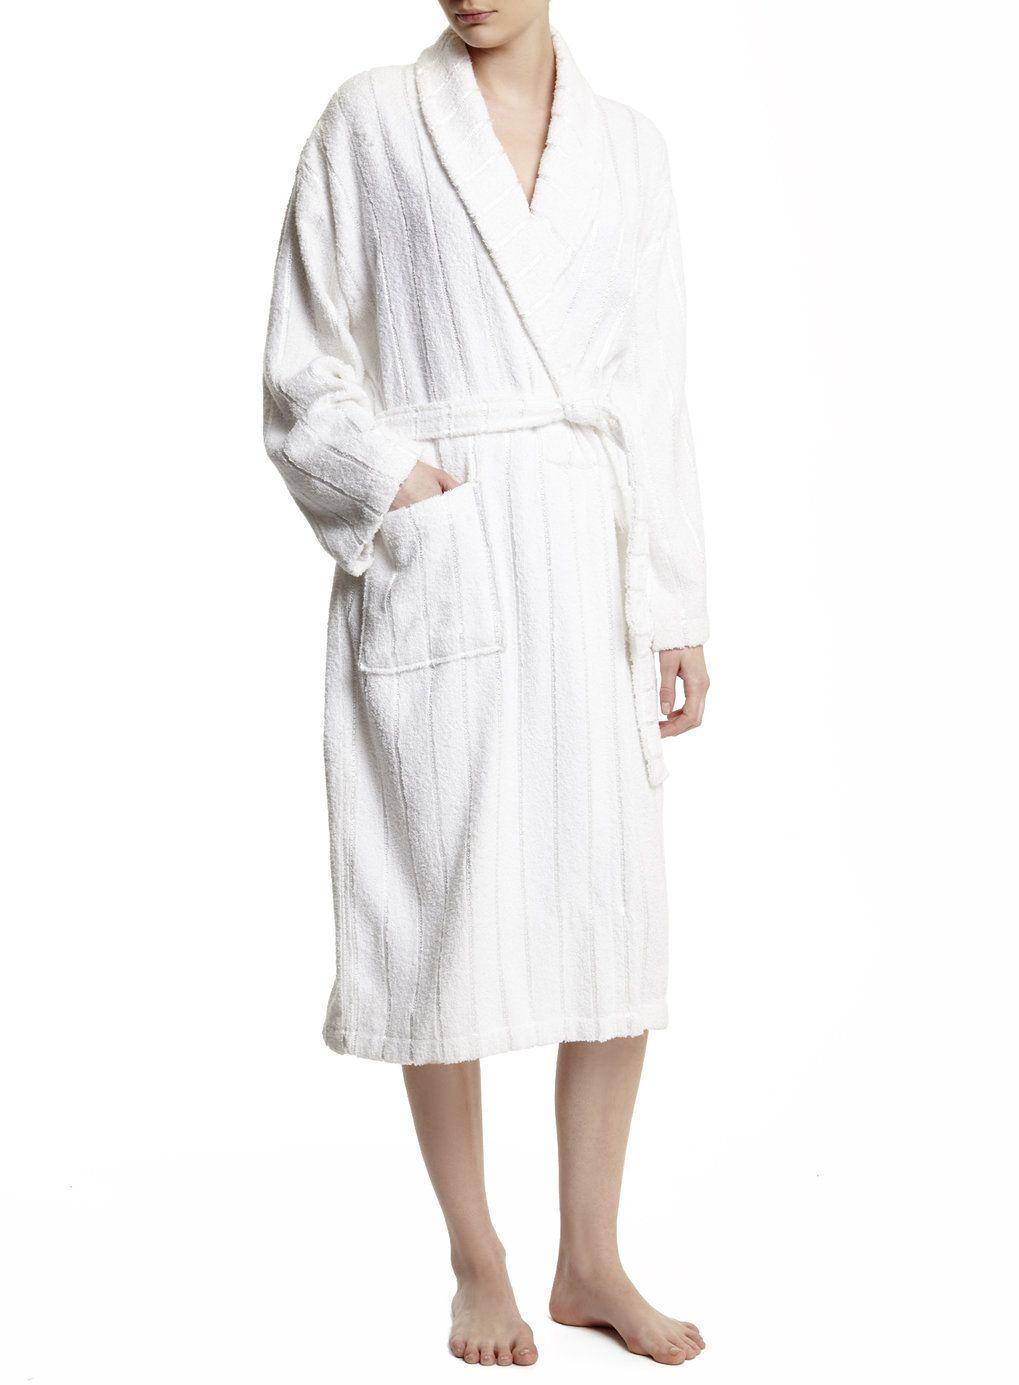 White Ladies Towelling Dressing Gown Towels Bath Dish Beach Etc